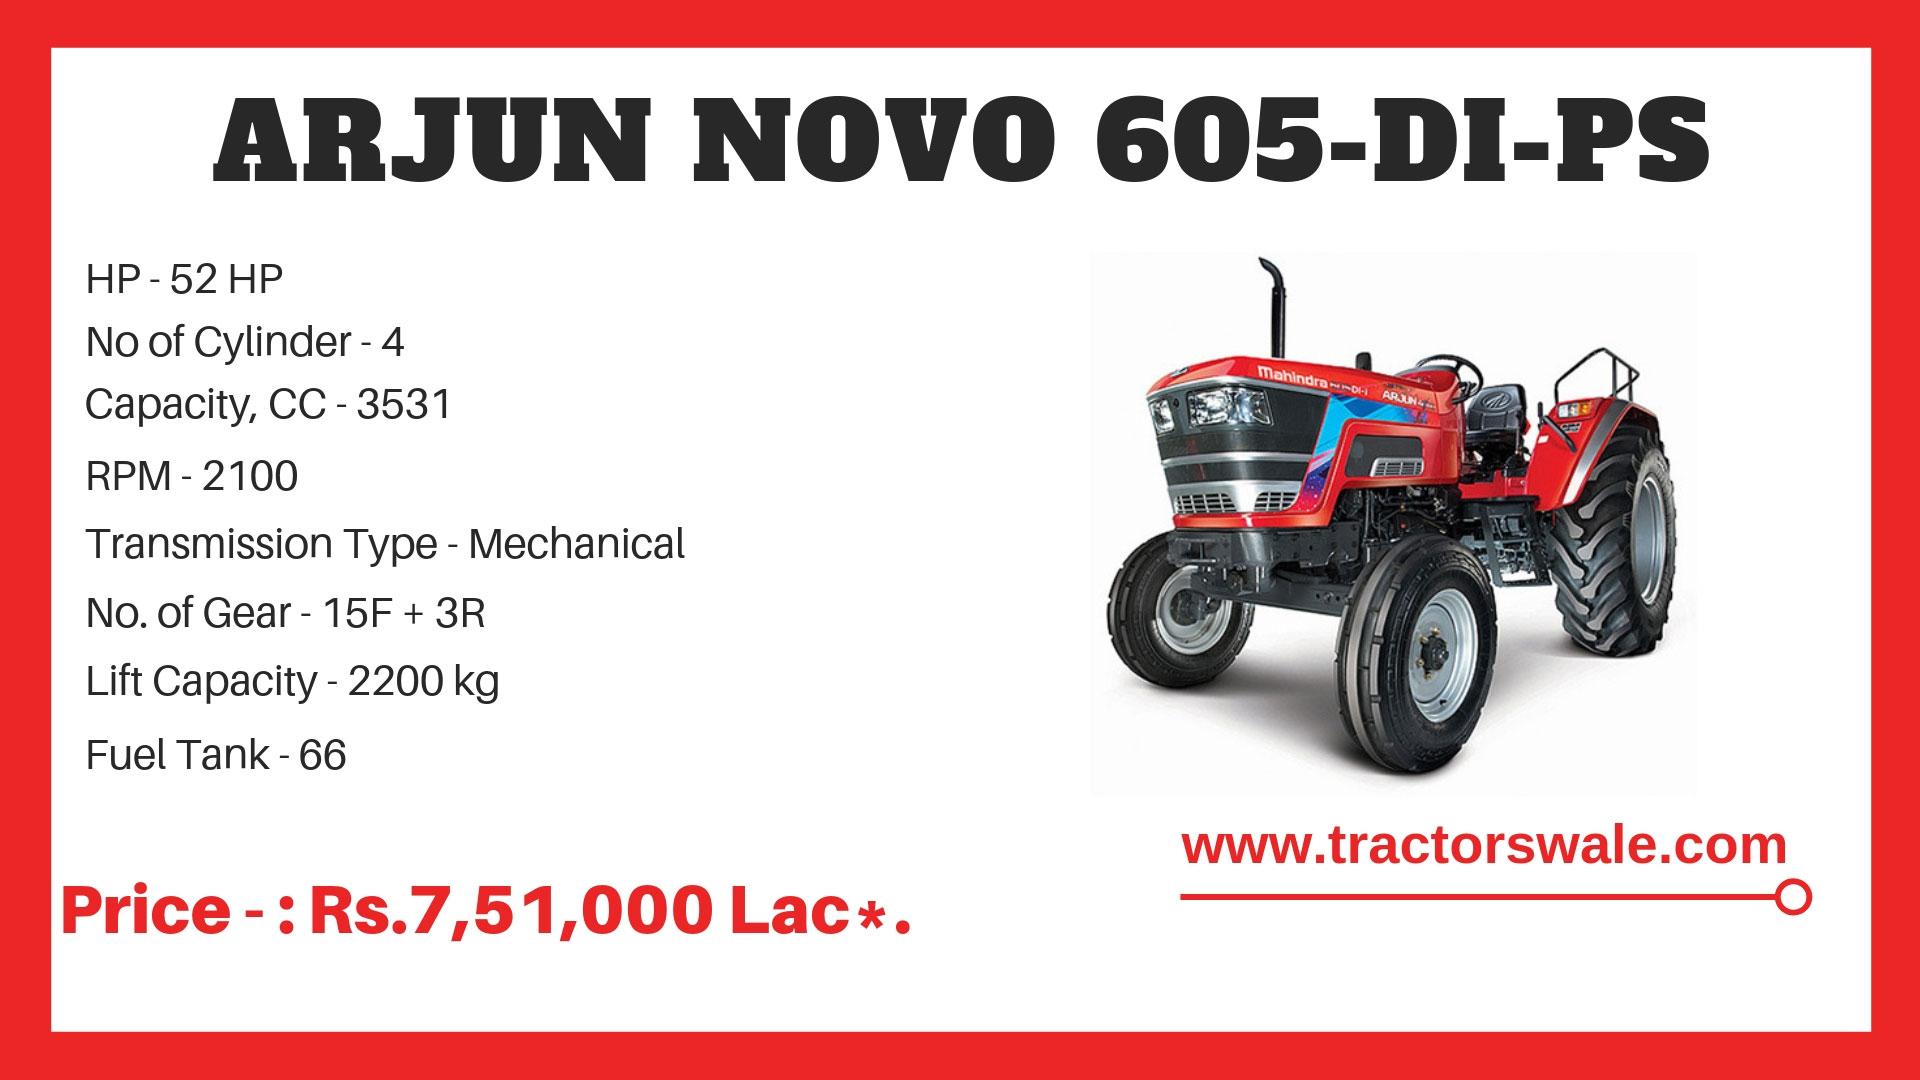 Mahindra-Arjun-Tractor-Novo-605-di-ps-tractor-specification